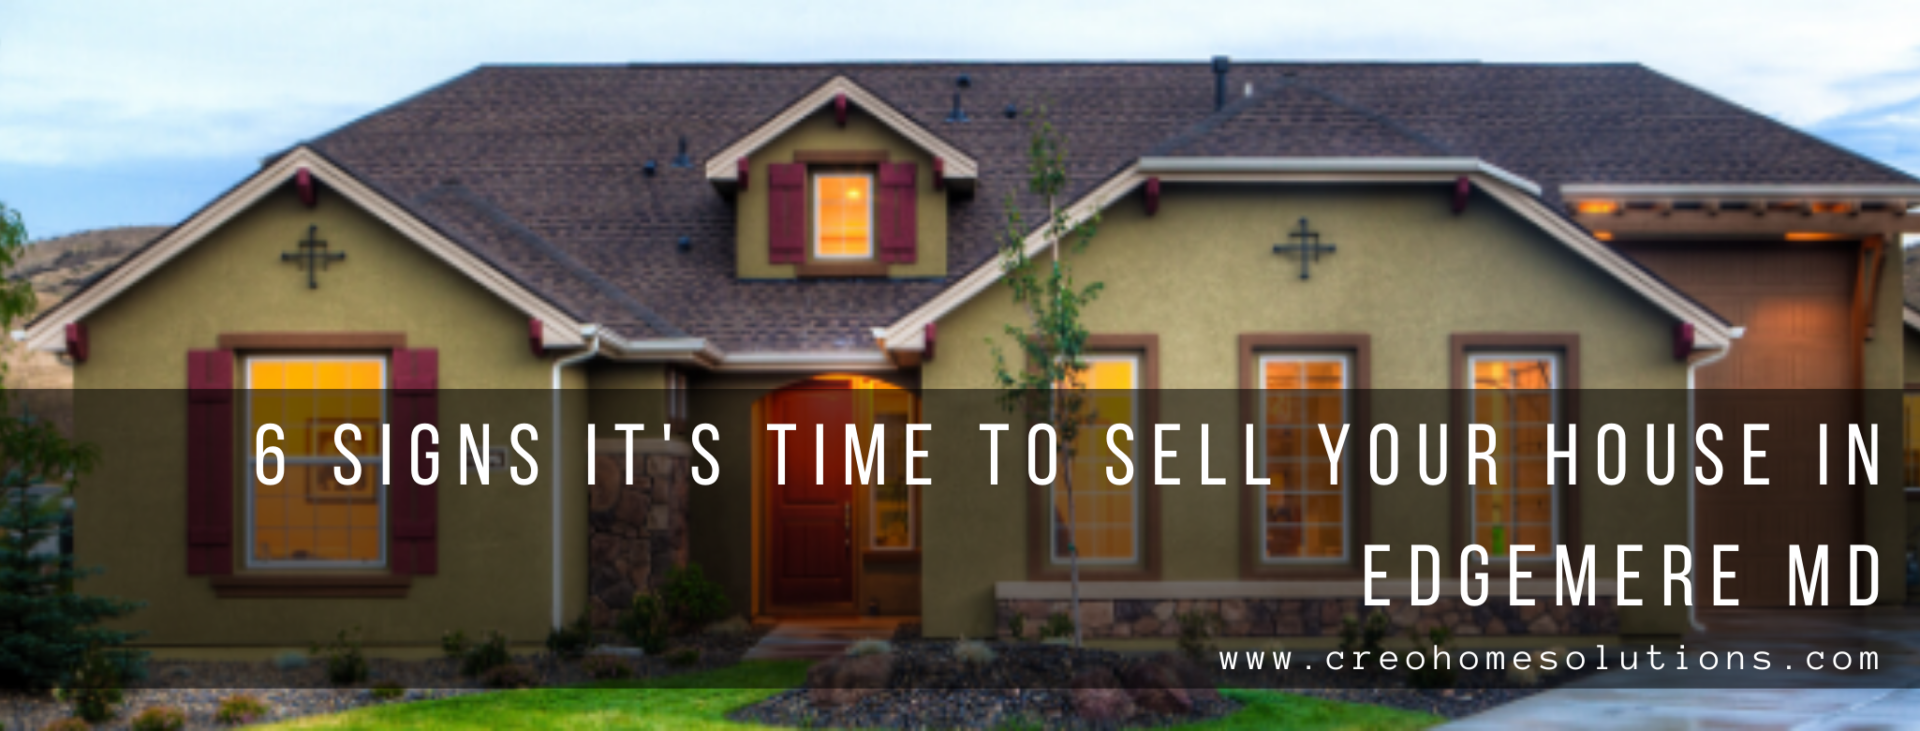 We buy properties in Edgemere MD